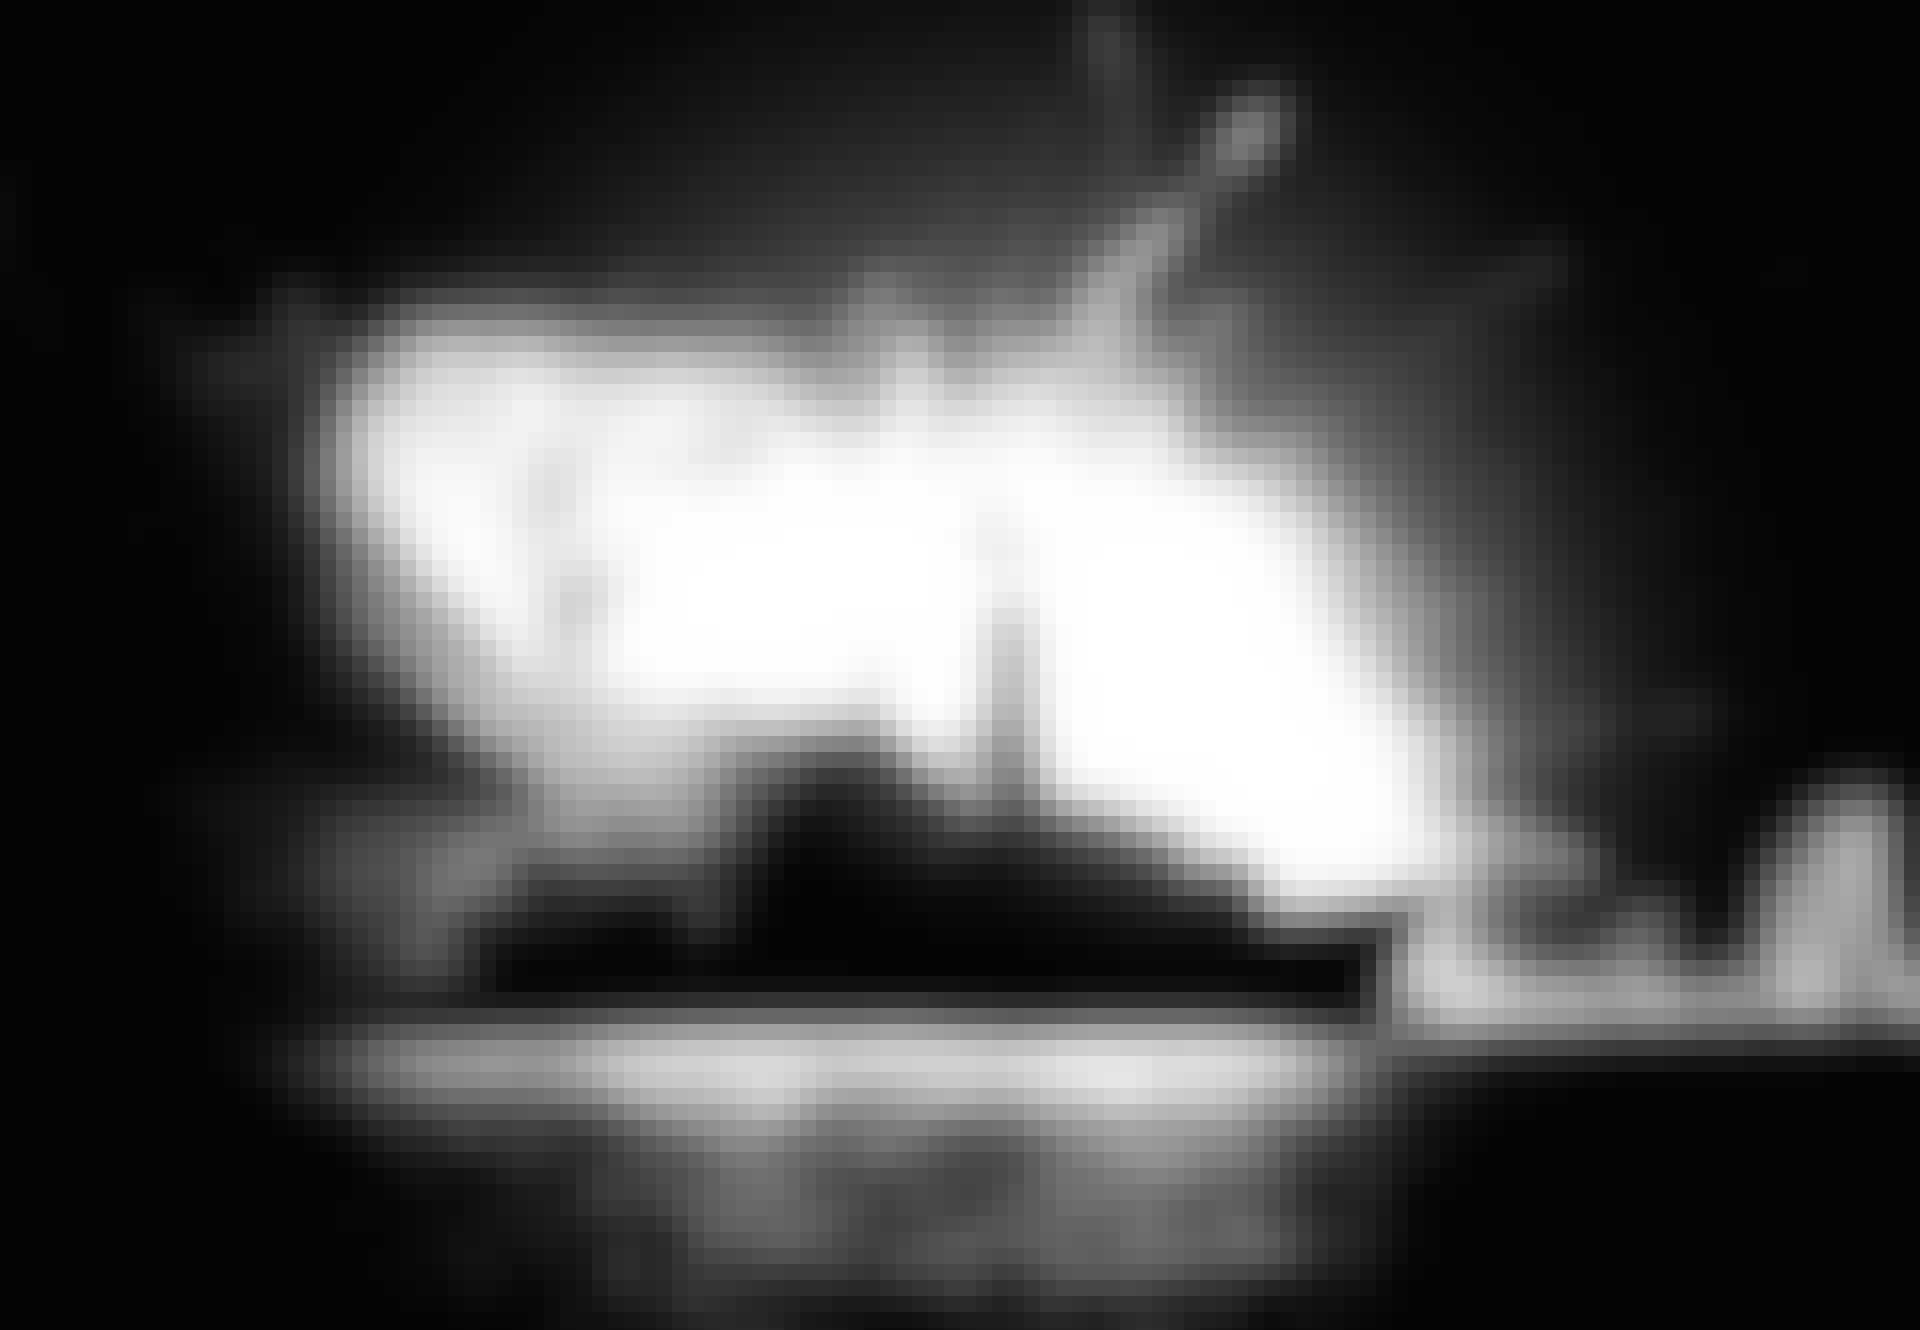 Bombingen av HMS-Antelope under Falklandskrigen